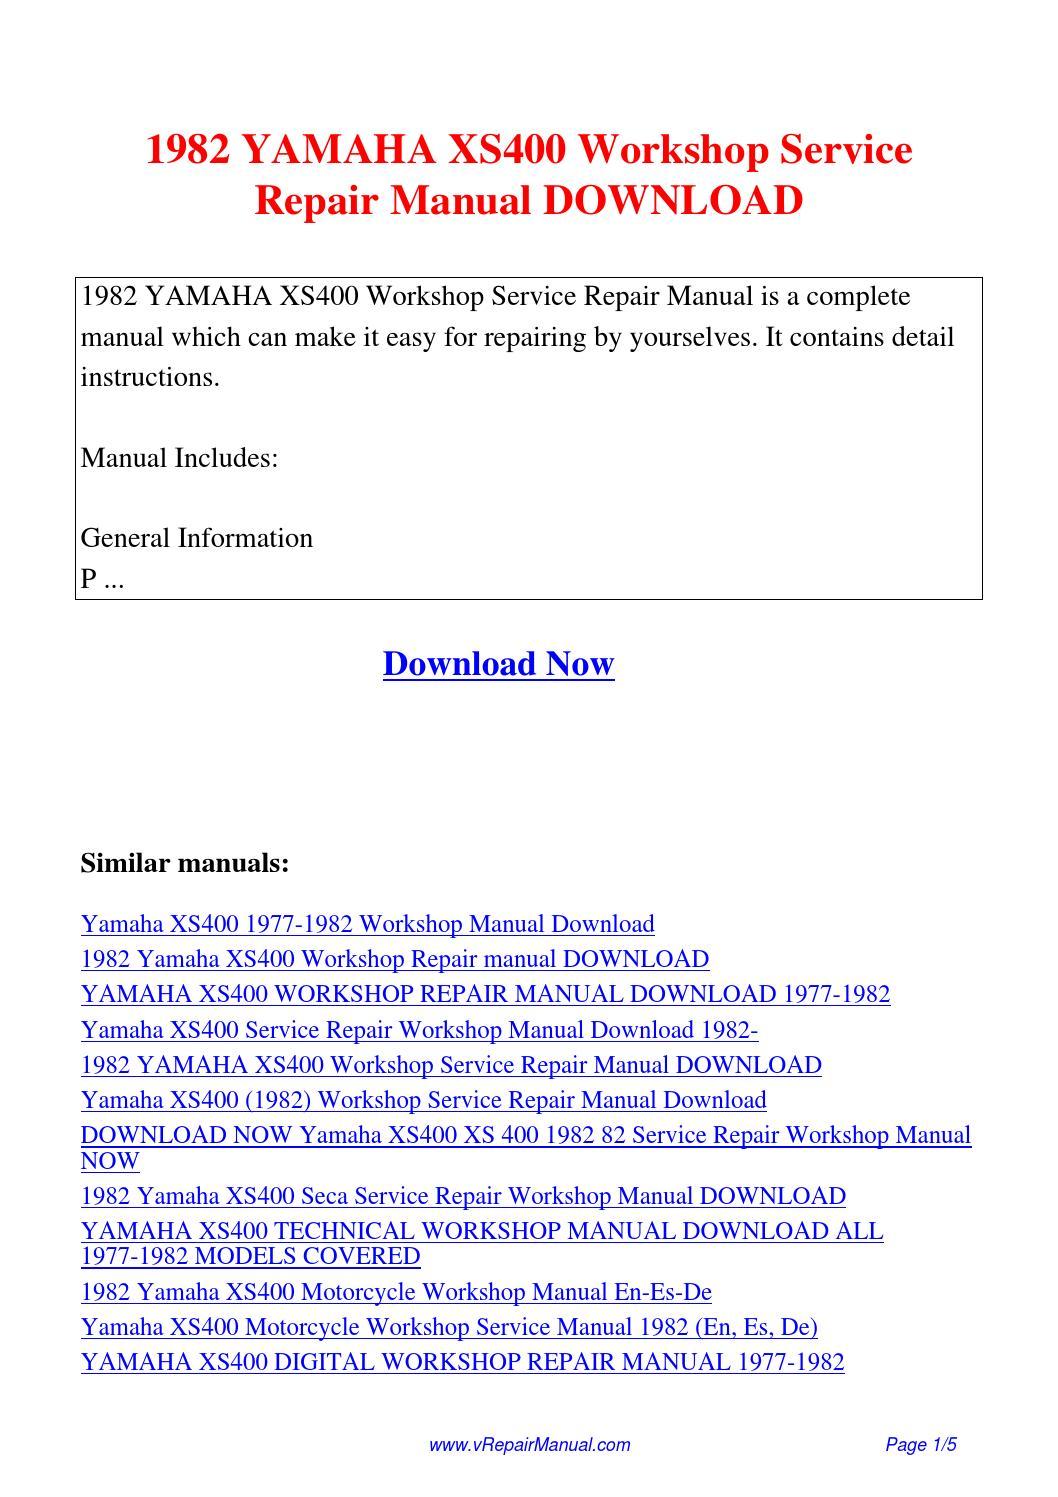 1982 Yamaha Xs400 Maxim Manual Xj750 Wiring Diagram Workshop Service Repair Pdf By David Zhang Rh Issuu Com Yics 400